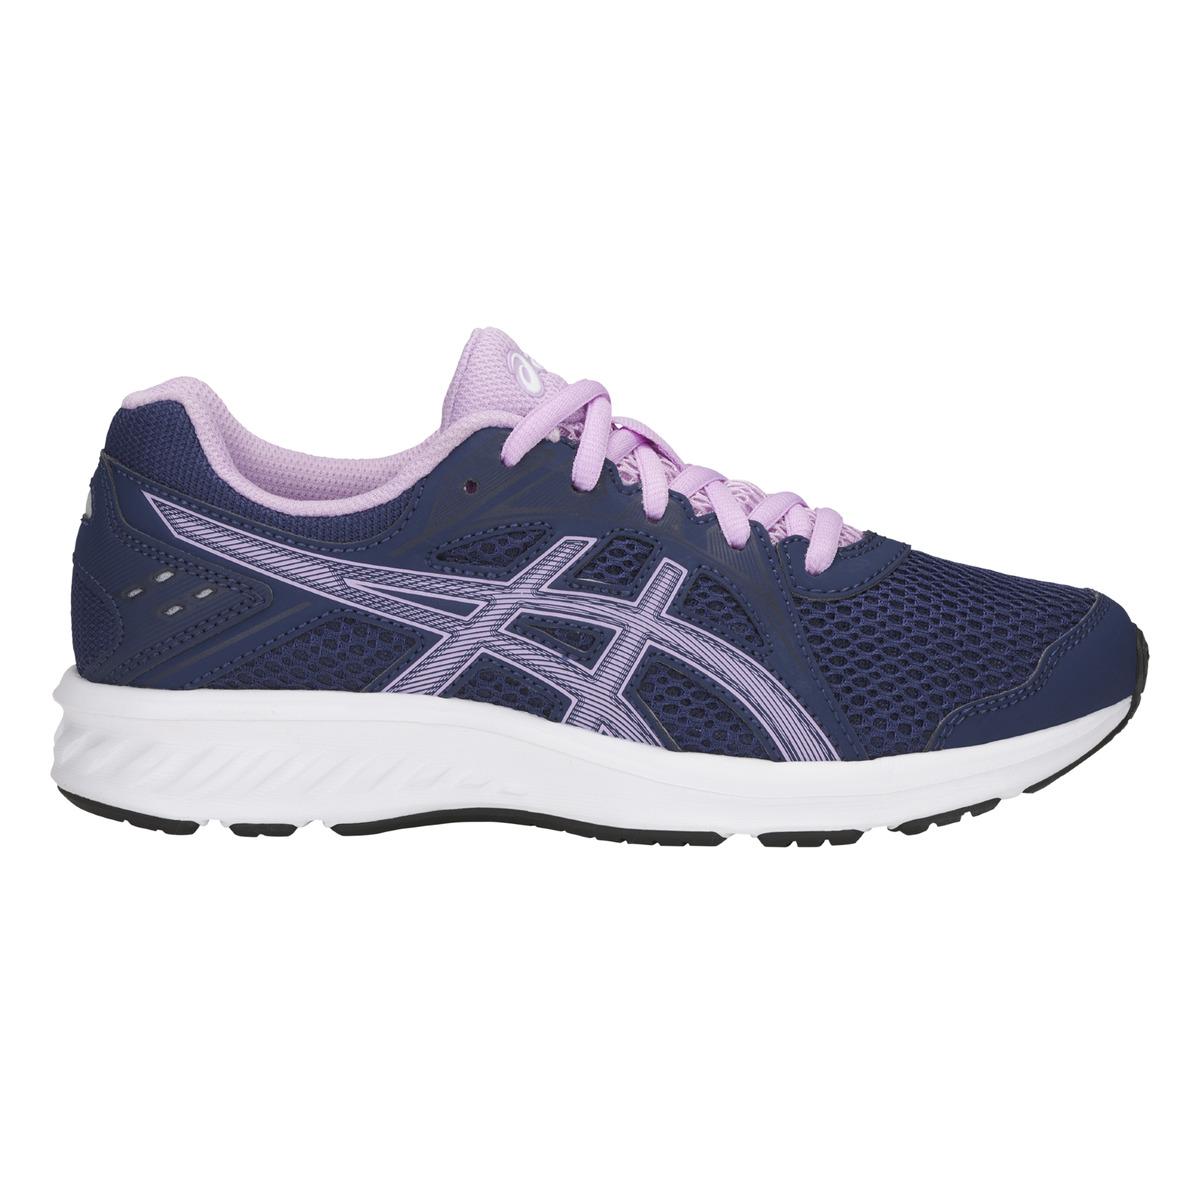 ASICS JOLT 2 Running Shoes.jpg